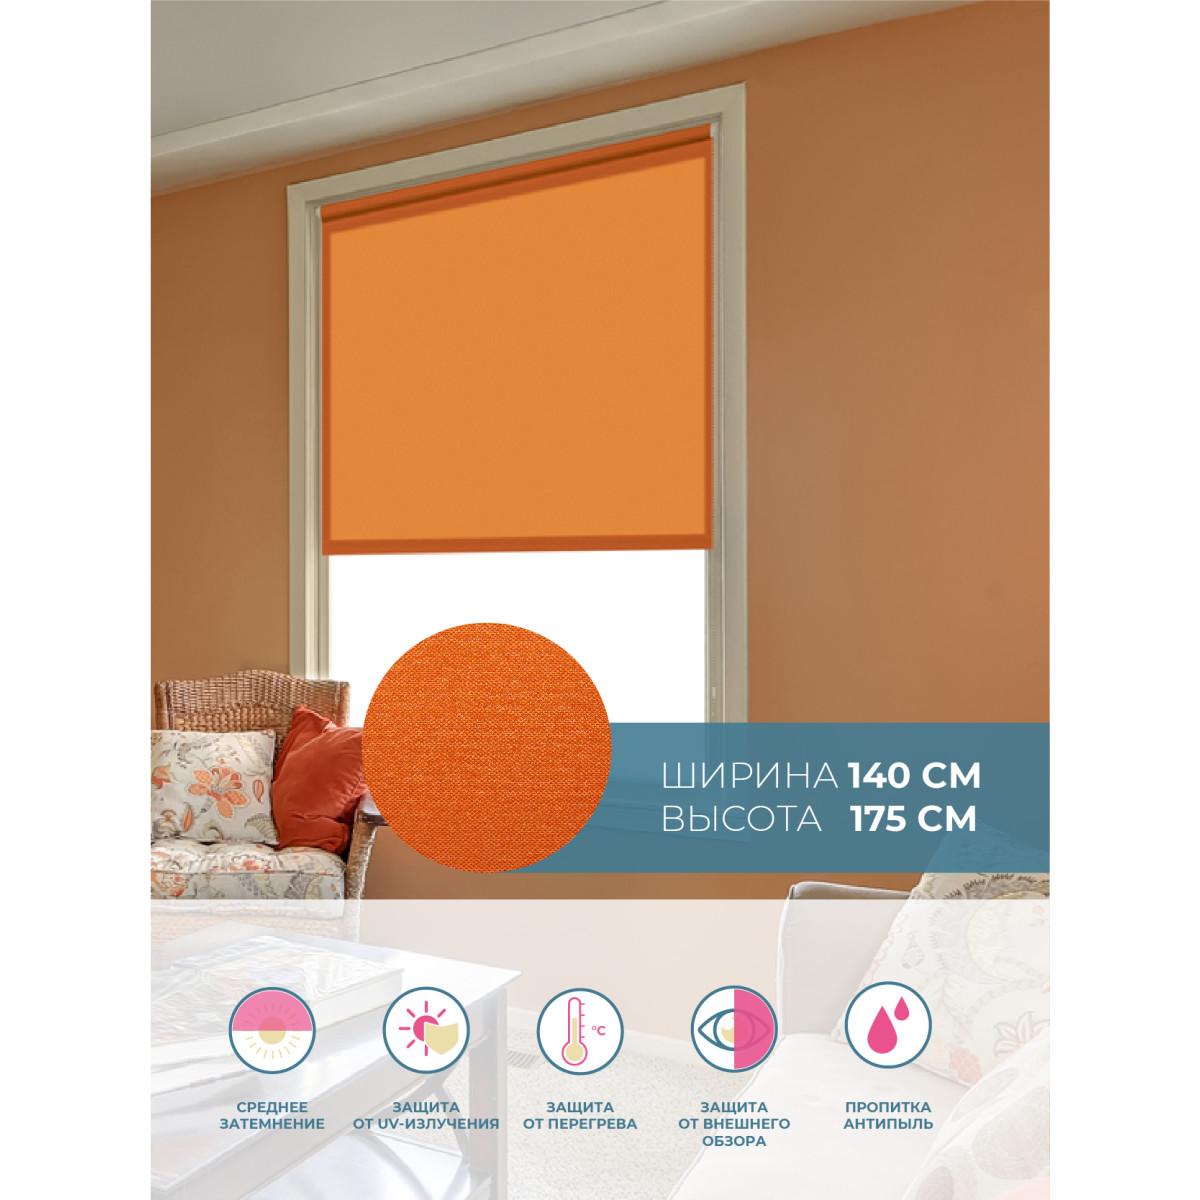 Рулонная Ора Decofest Плайн 140Х175 Цвет Оранжевый